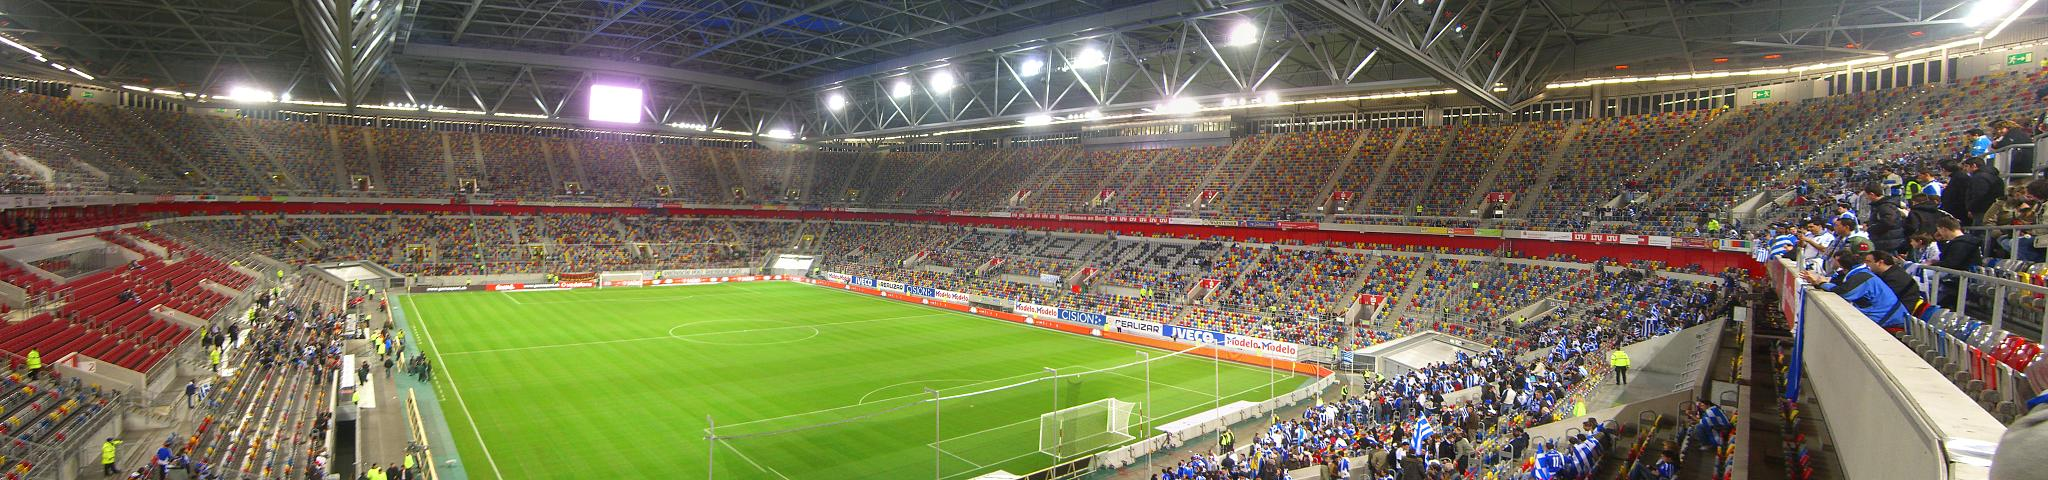 Panorama der ESPRIT arena